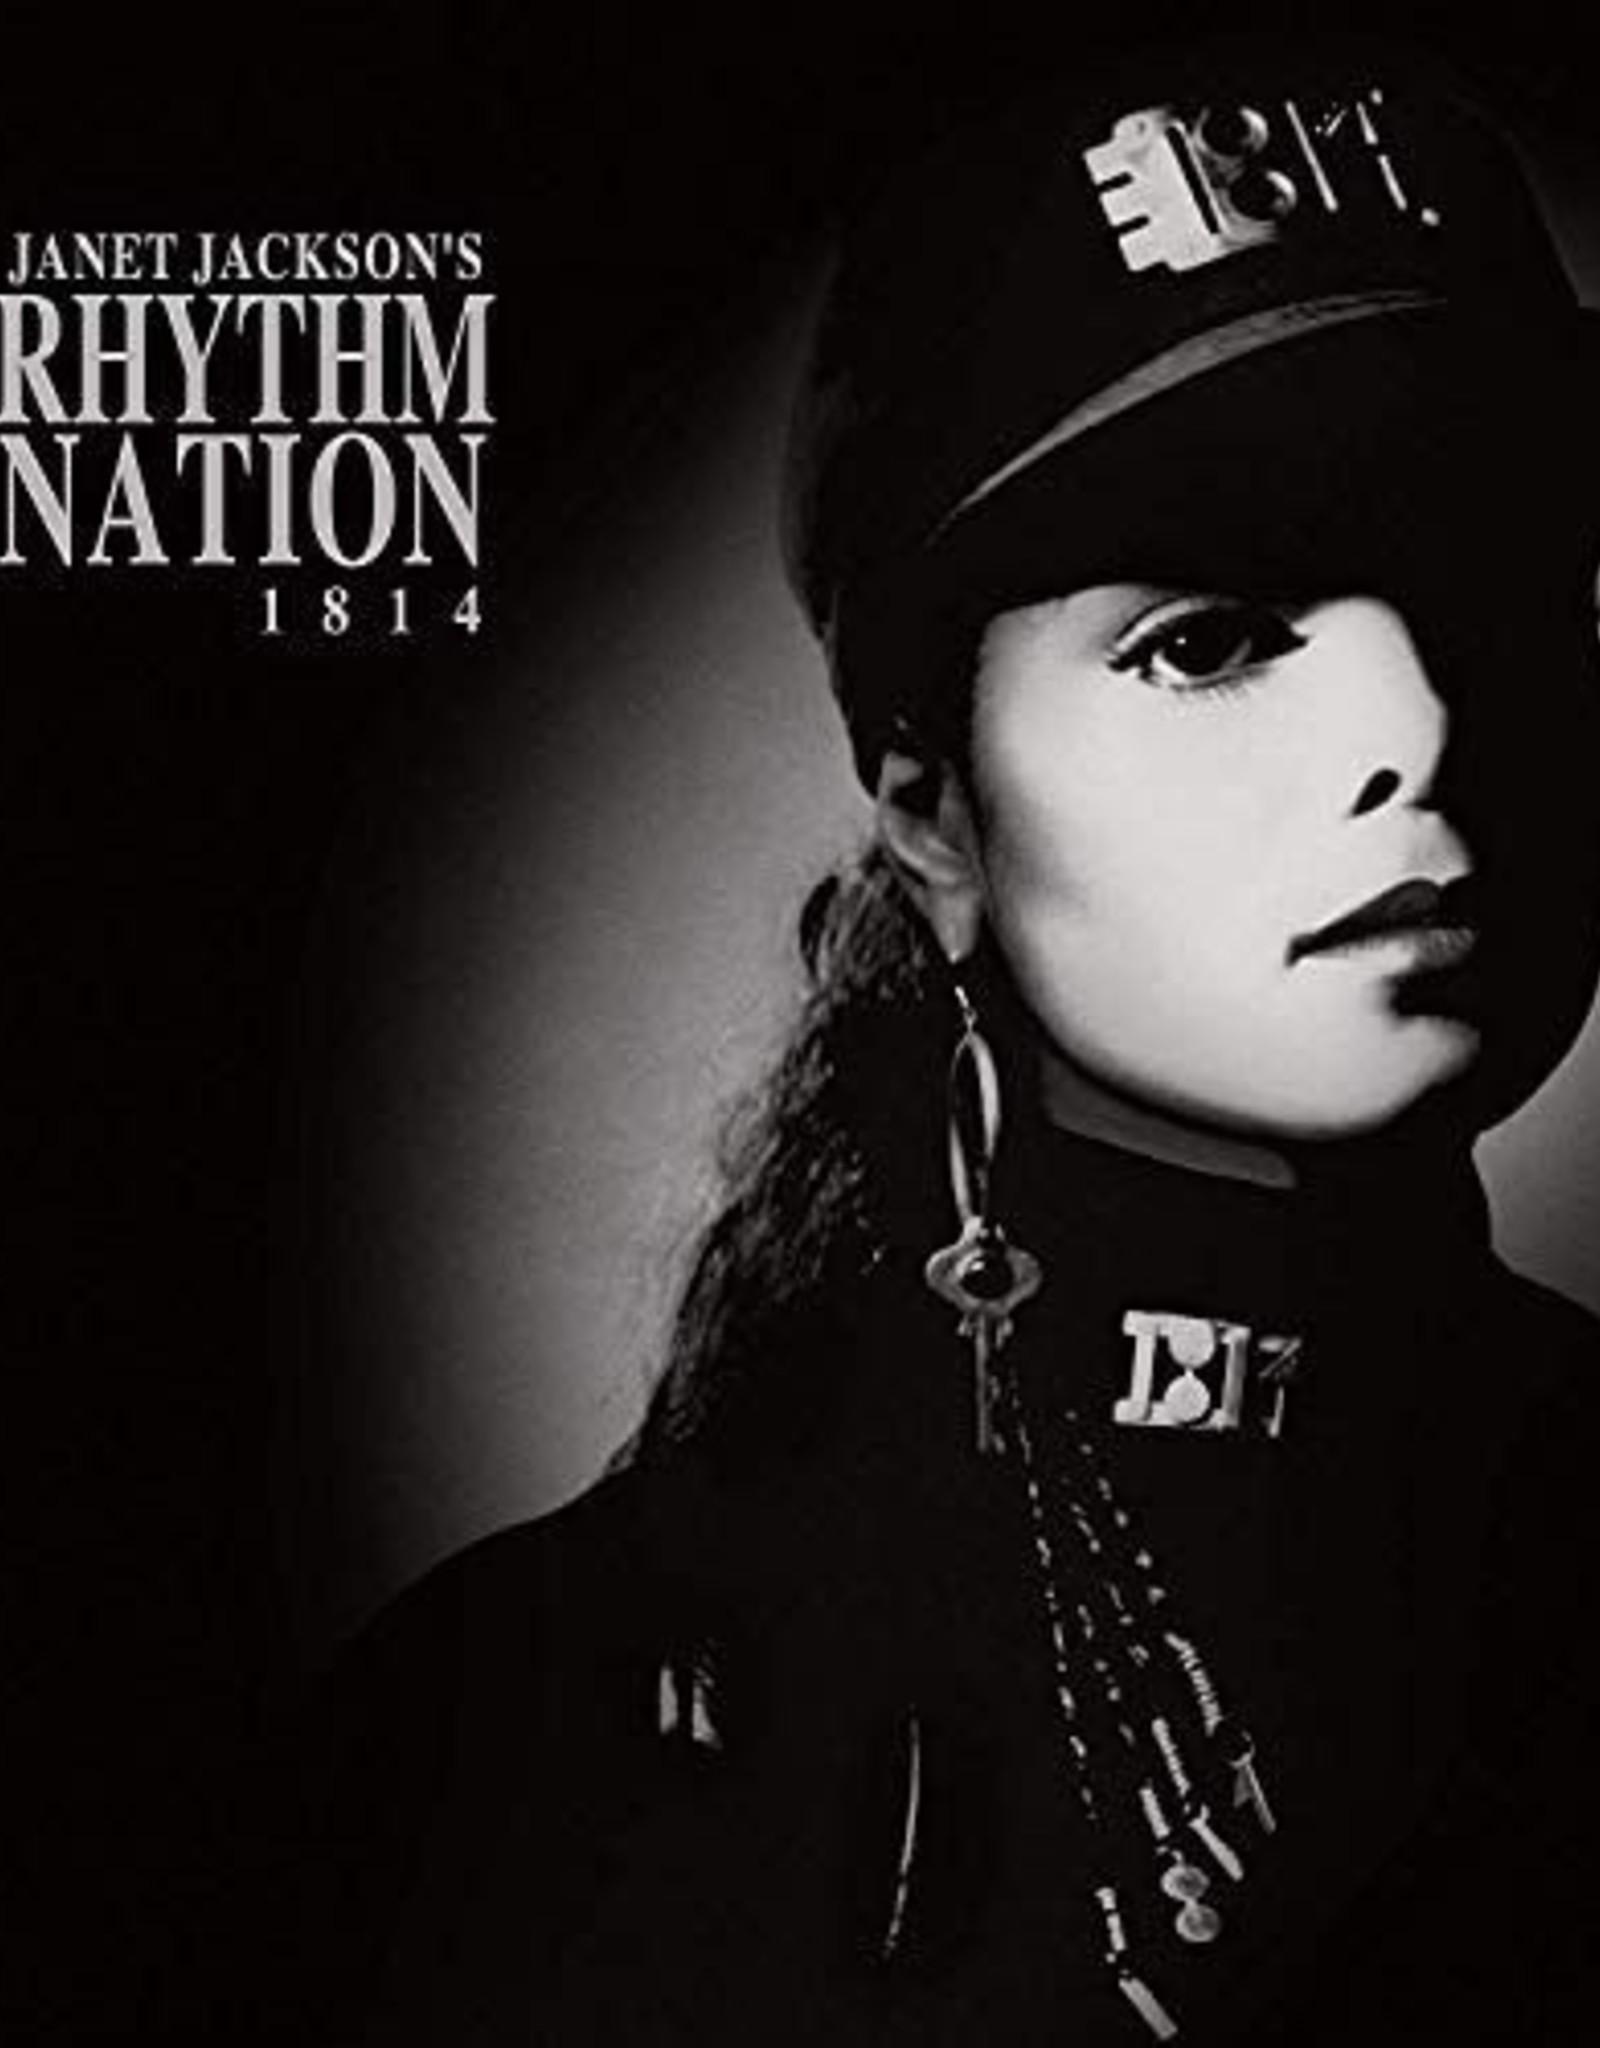 Janet Jackson - Janet Jackson'S Rhythm Nation 1814 (2 Lp)